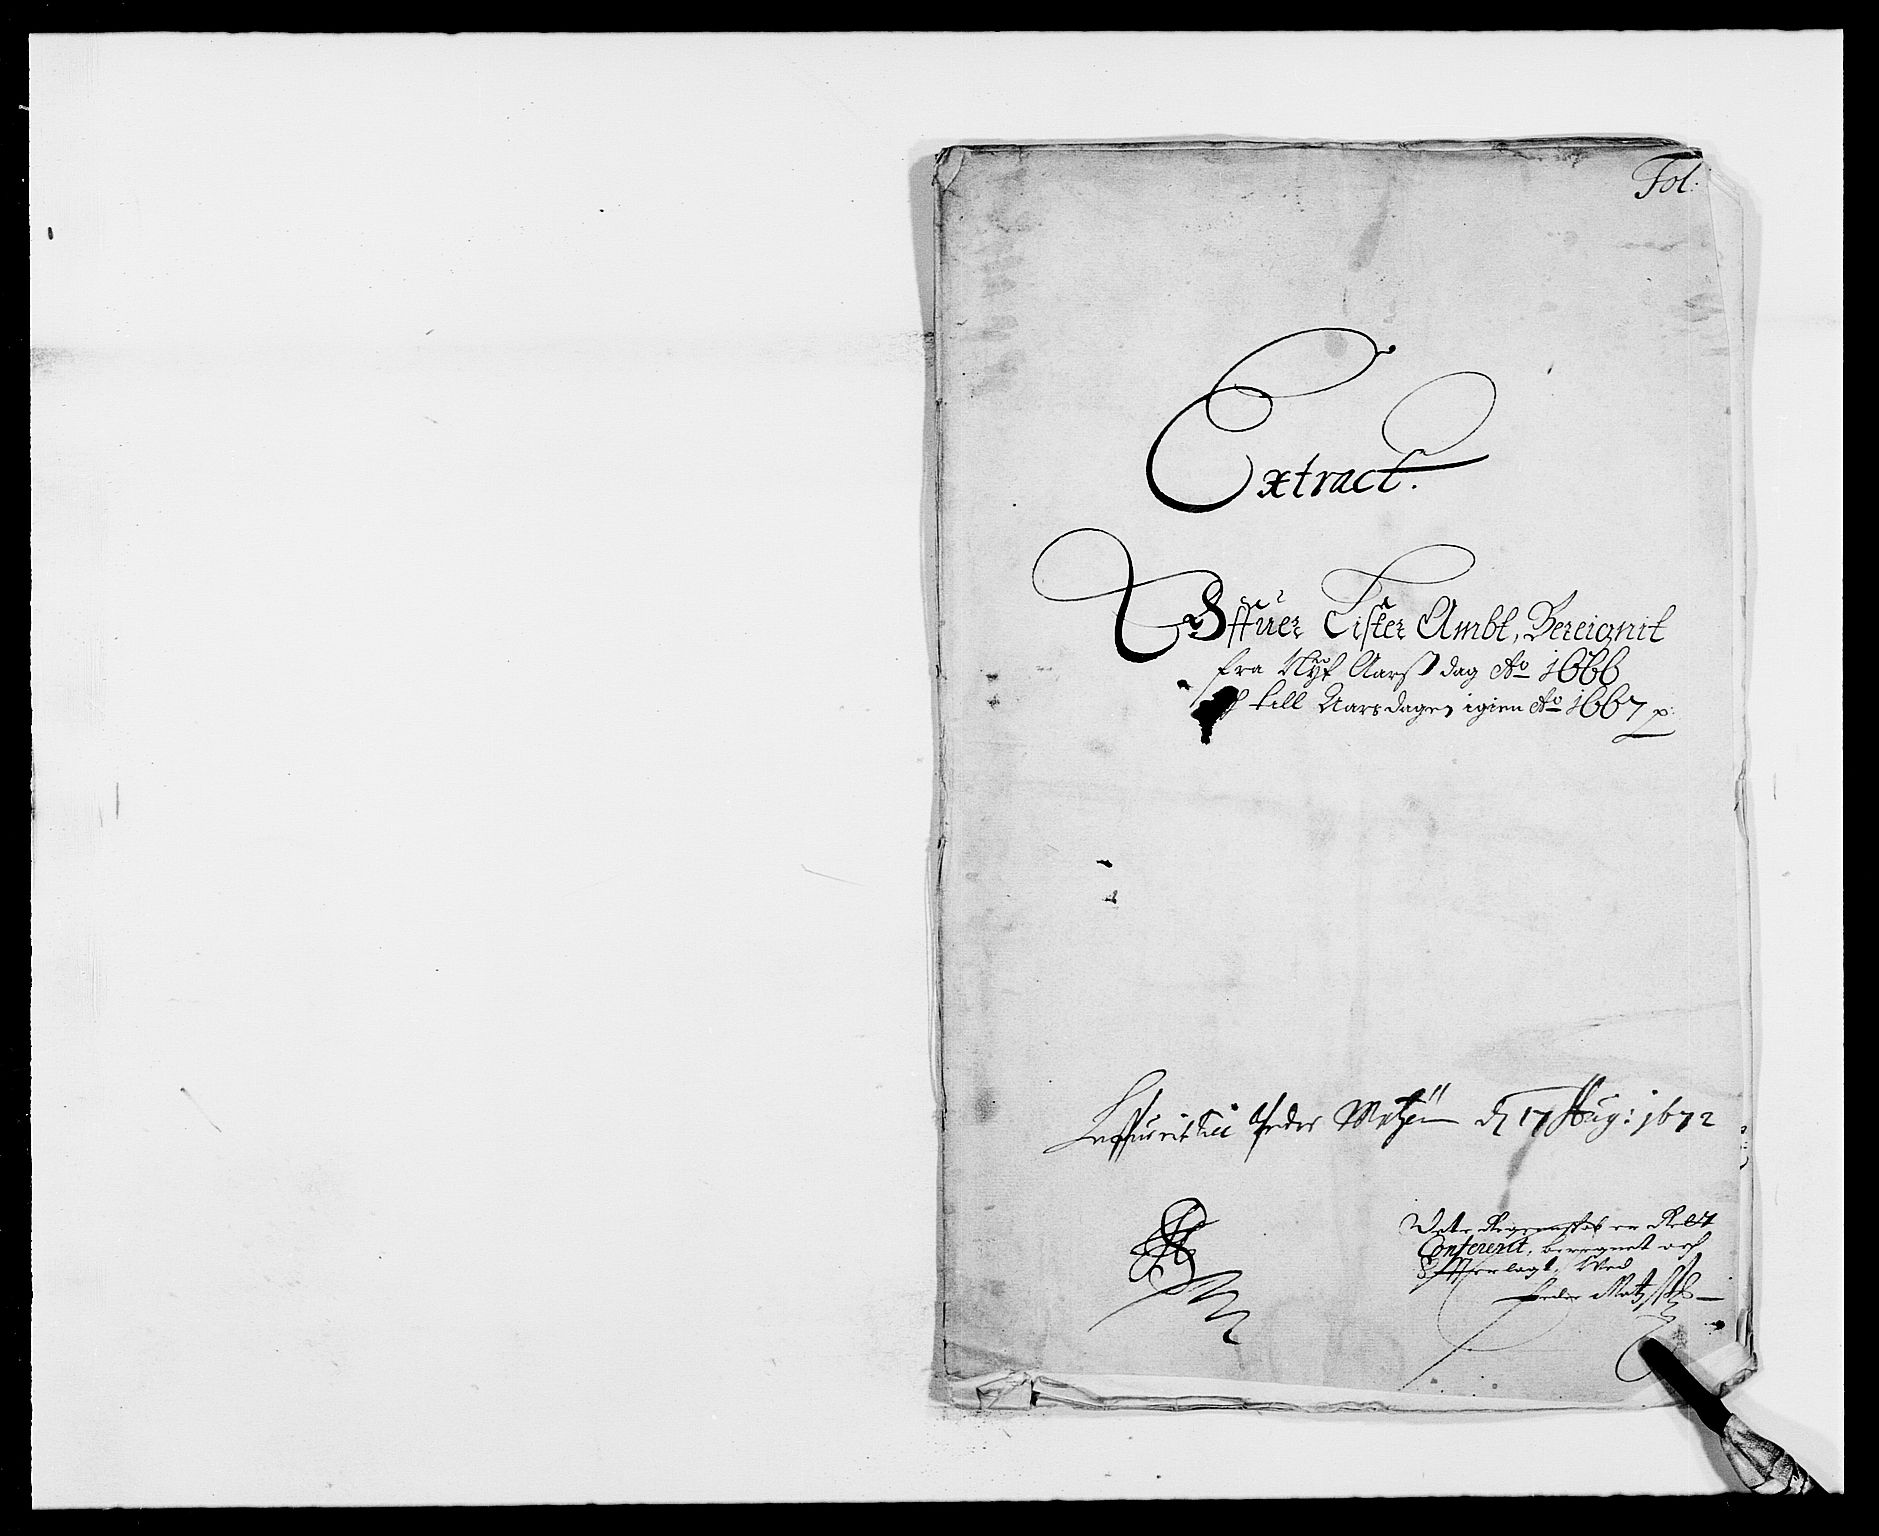 RA, Rentekammeret inntil 1814, Reviderte regnskaper, Fogderegnskap, R41/L2524: Fogderegnskap Lista, 1665-1668, s. 152